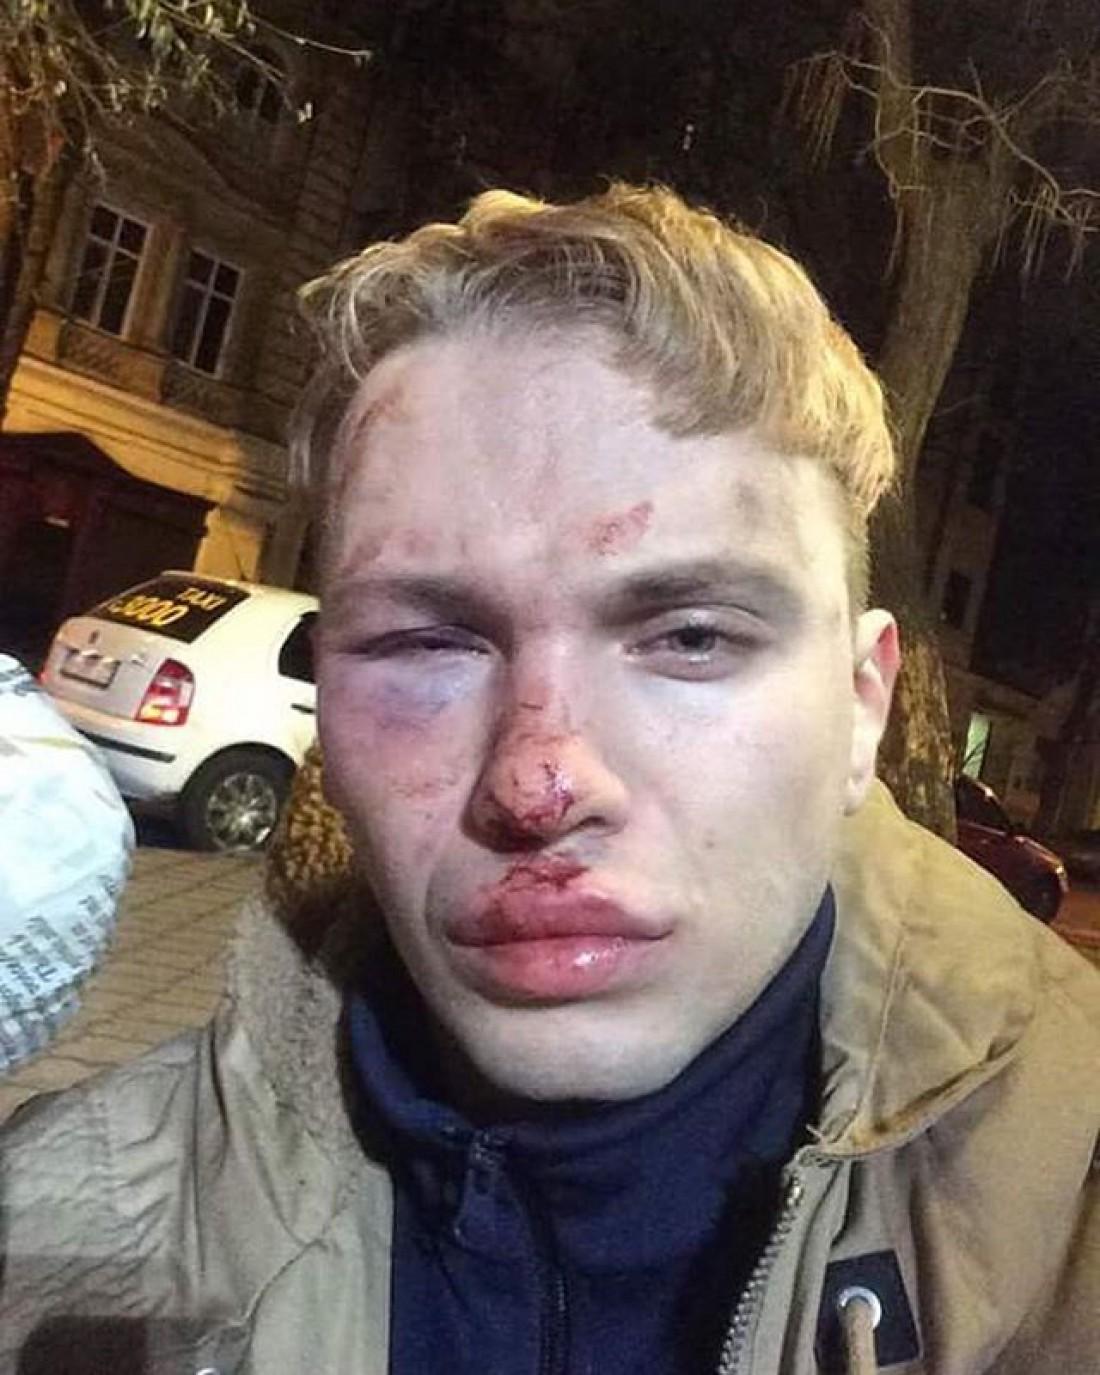 ВОдессе избили иобокрали протеже Ивана Дорна